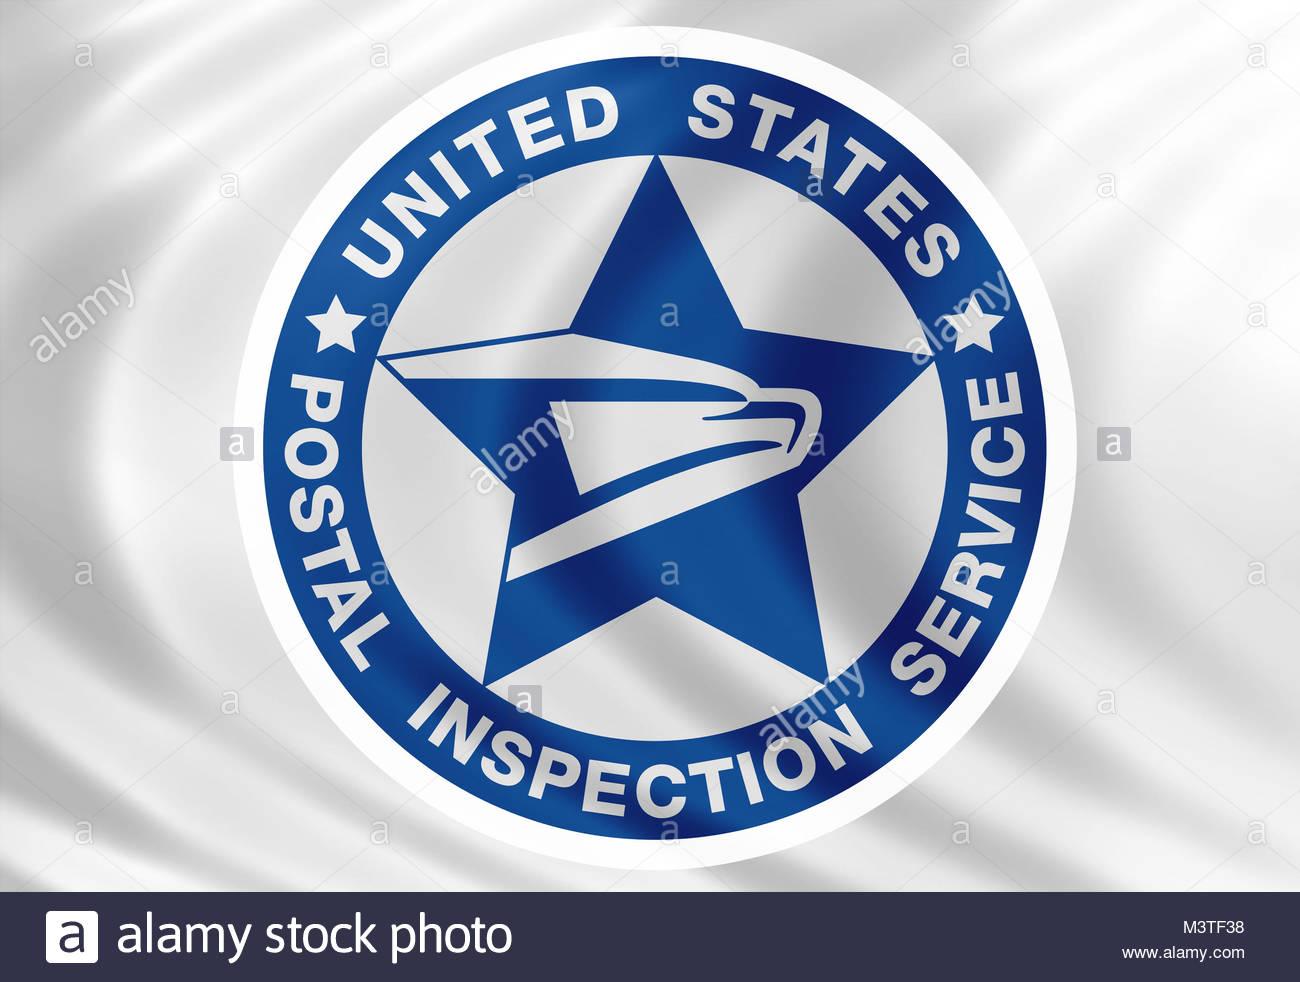 Postal logo stock photos postal logo stock images alamy united states postal inspection service uspis icon logo brand stock image buycottarizona